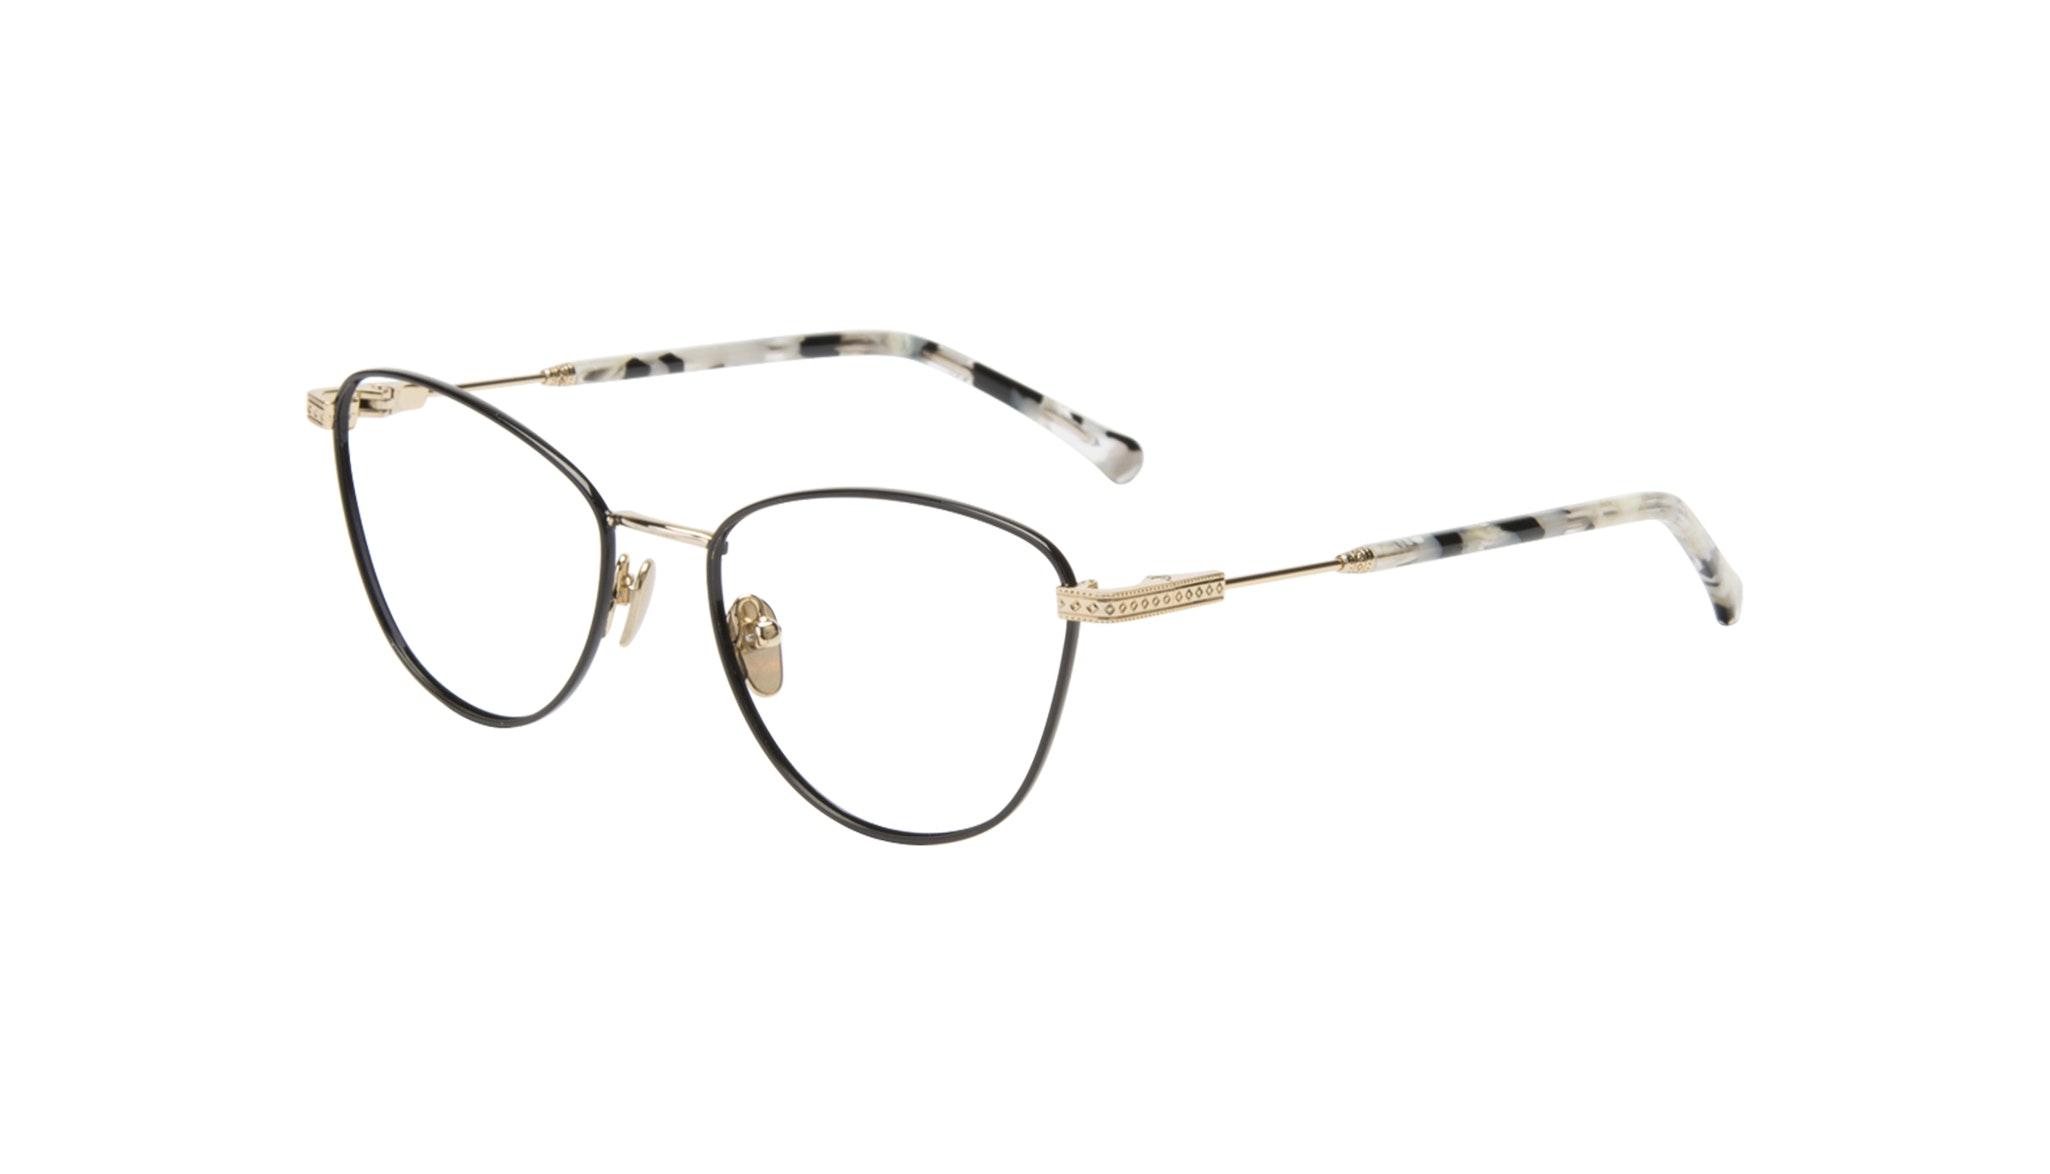 Affordable Fashion Glasses Cat Eye Eyeglasses Women Bow Onyx Marble Tilt